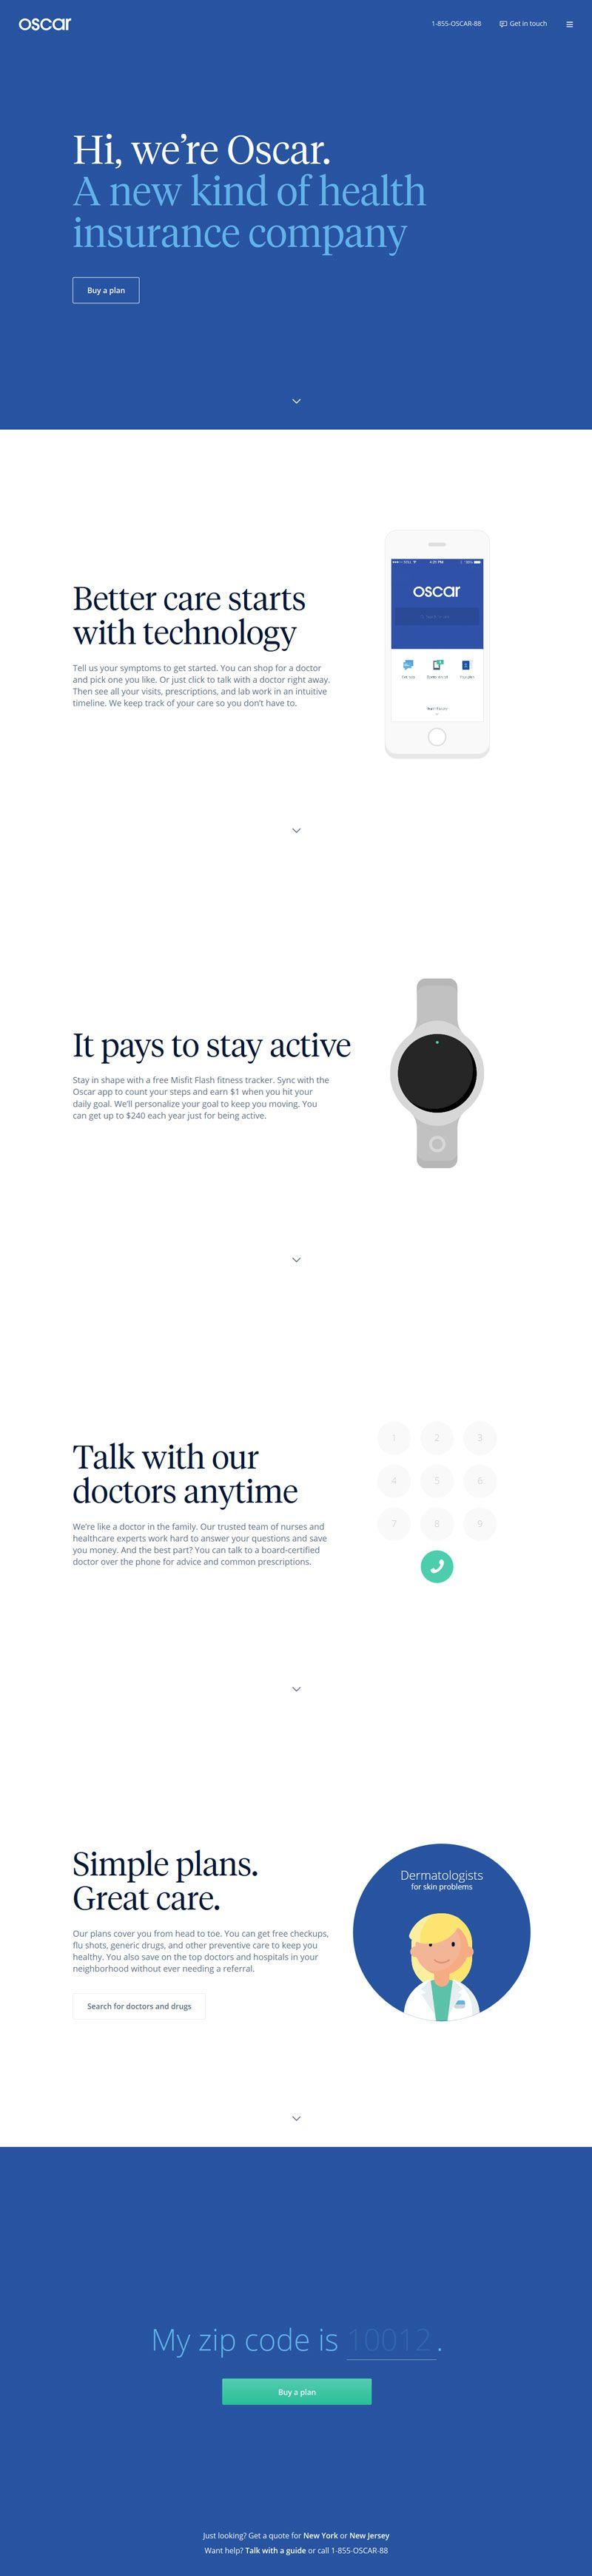 Oscar Flat Design Web Design Flat Design Website Website Design